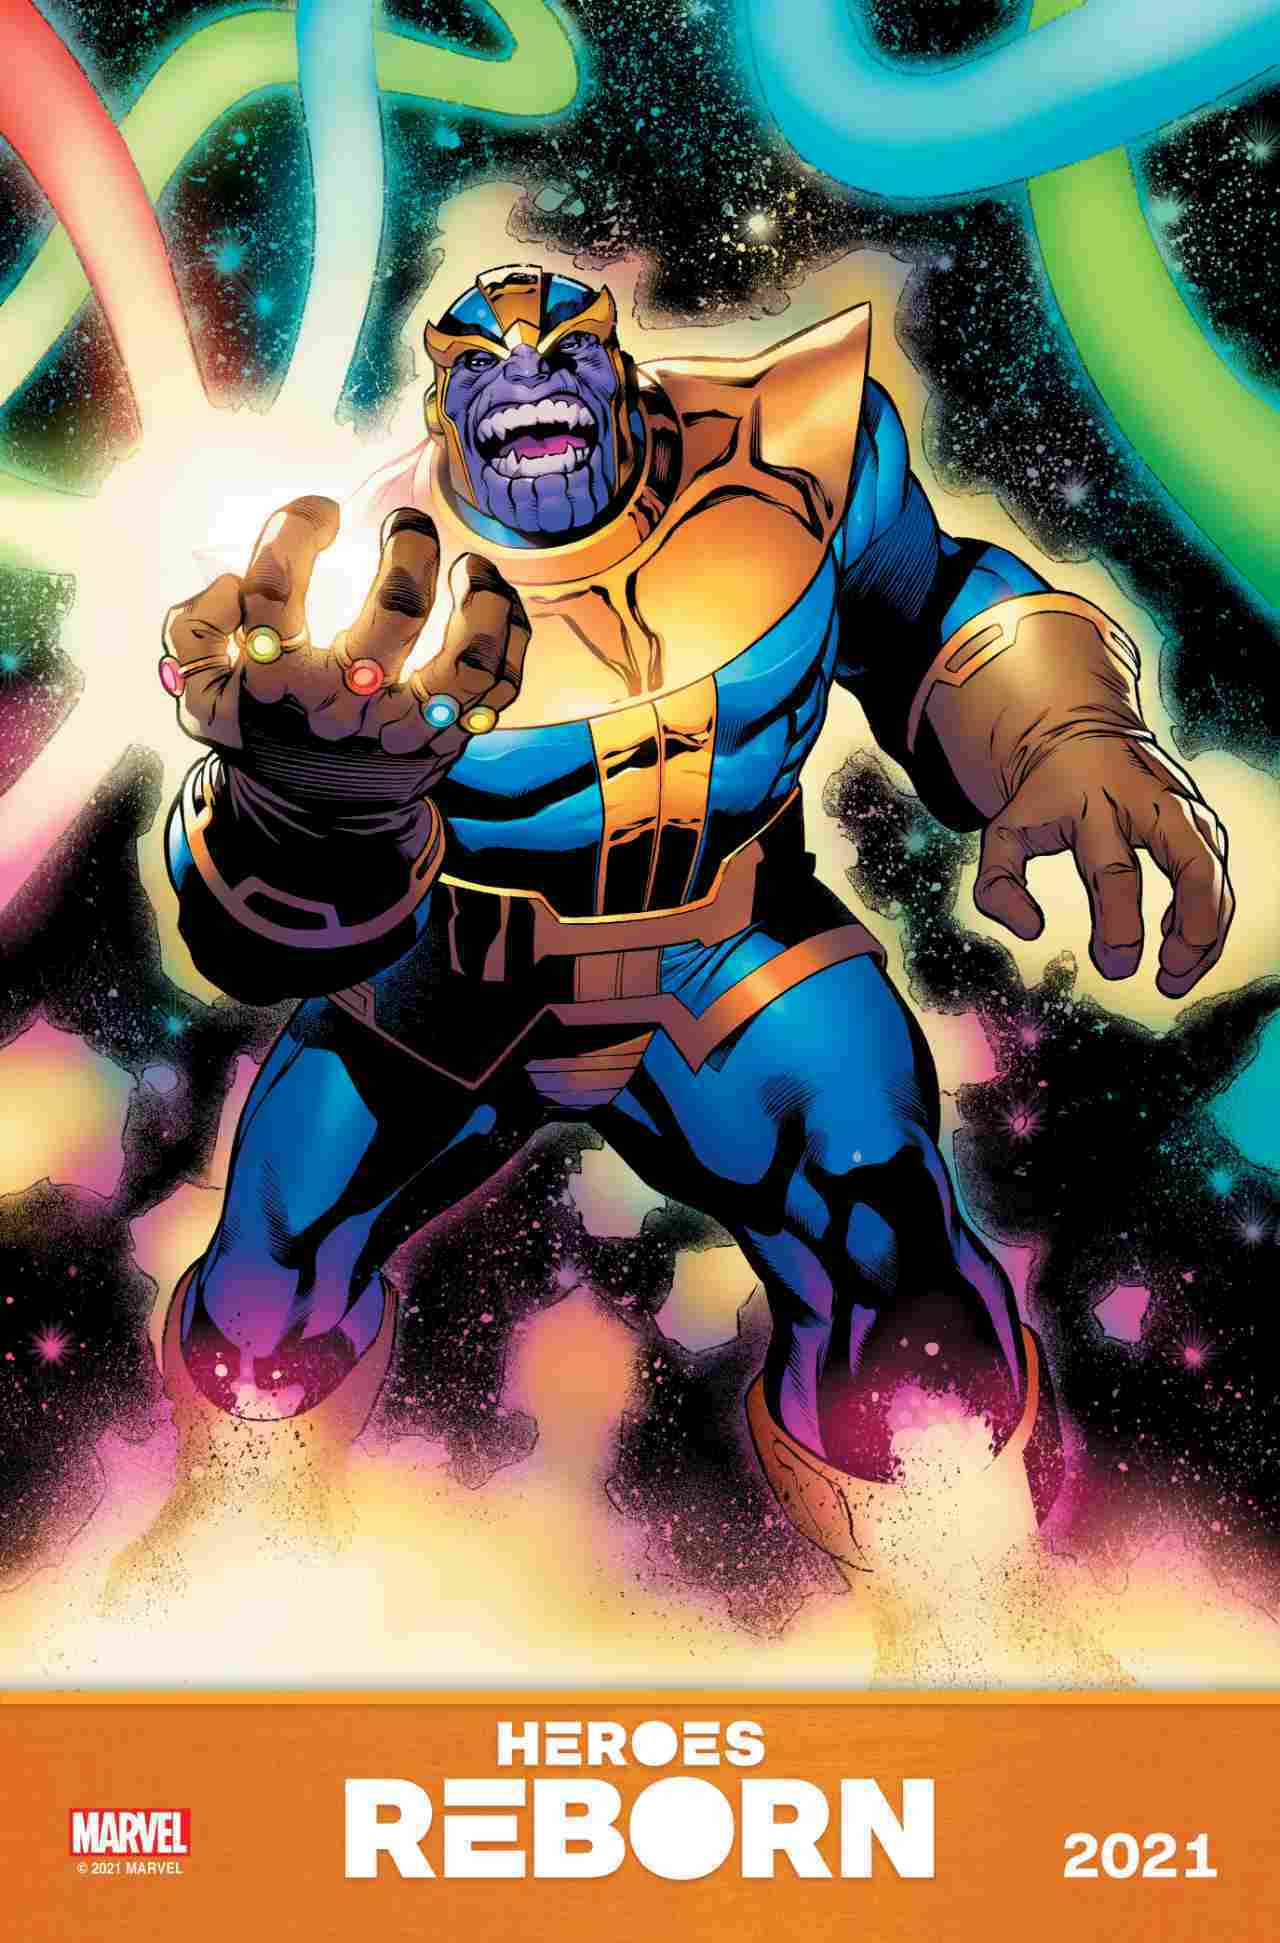 HeroesReborn-Thanos